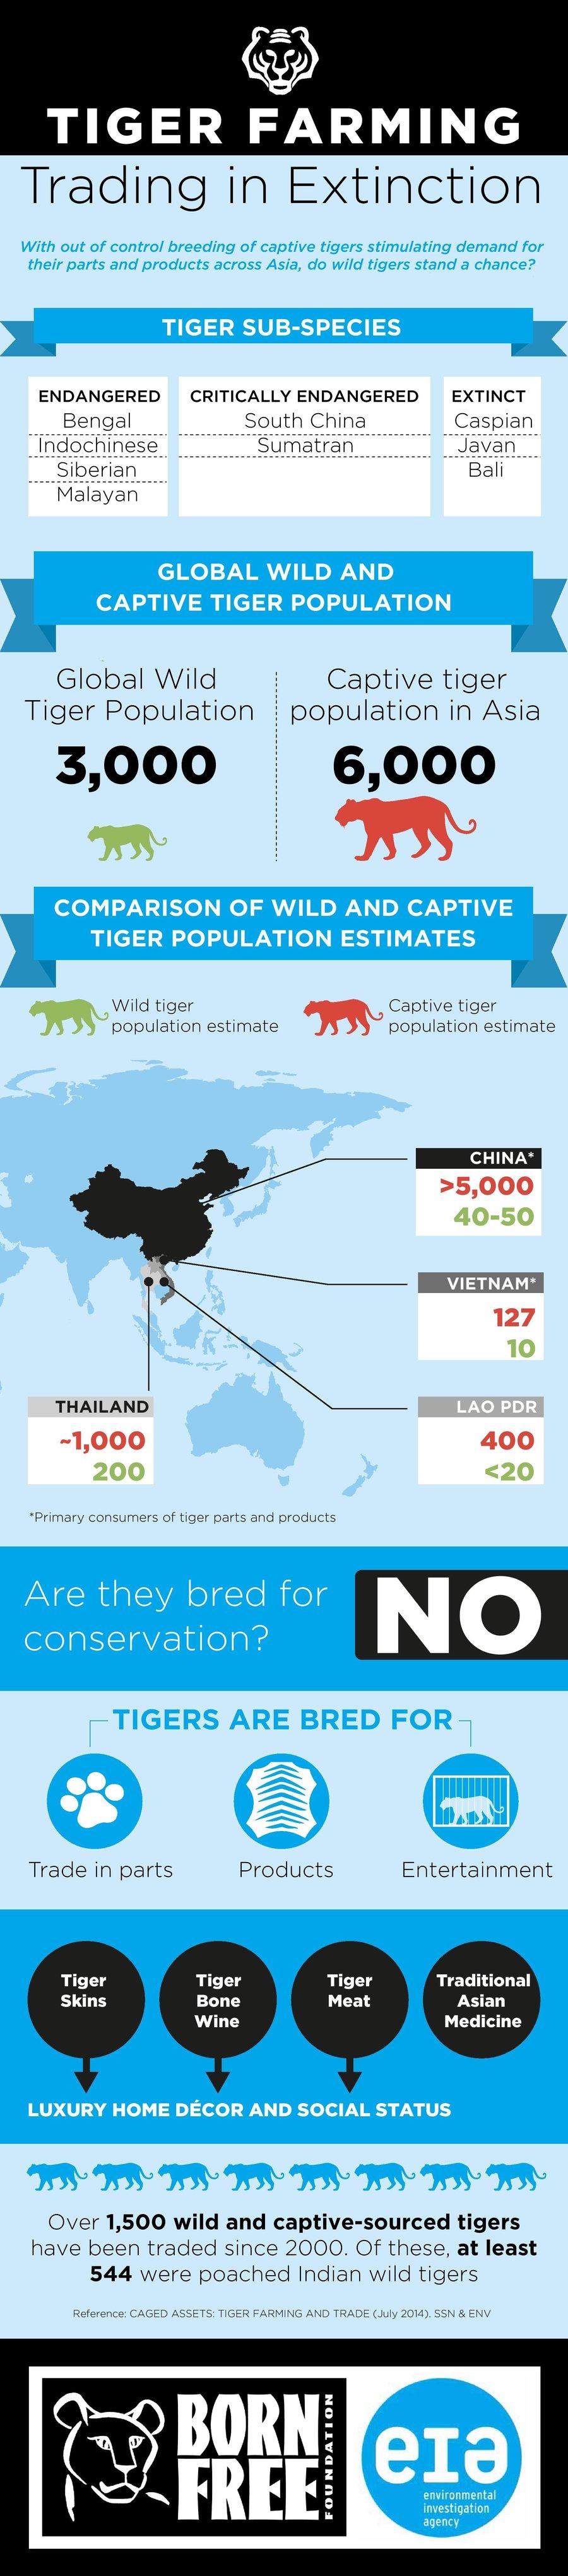 Tiger Farming: Trading in Extinction